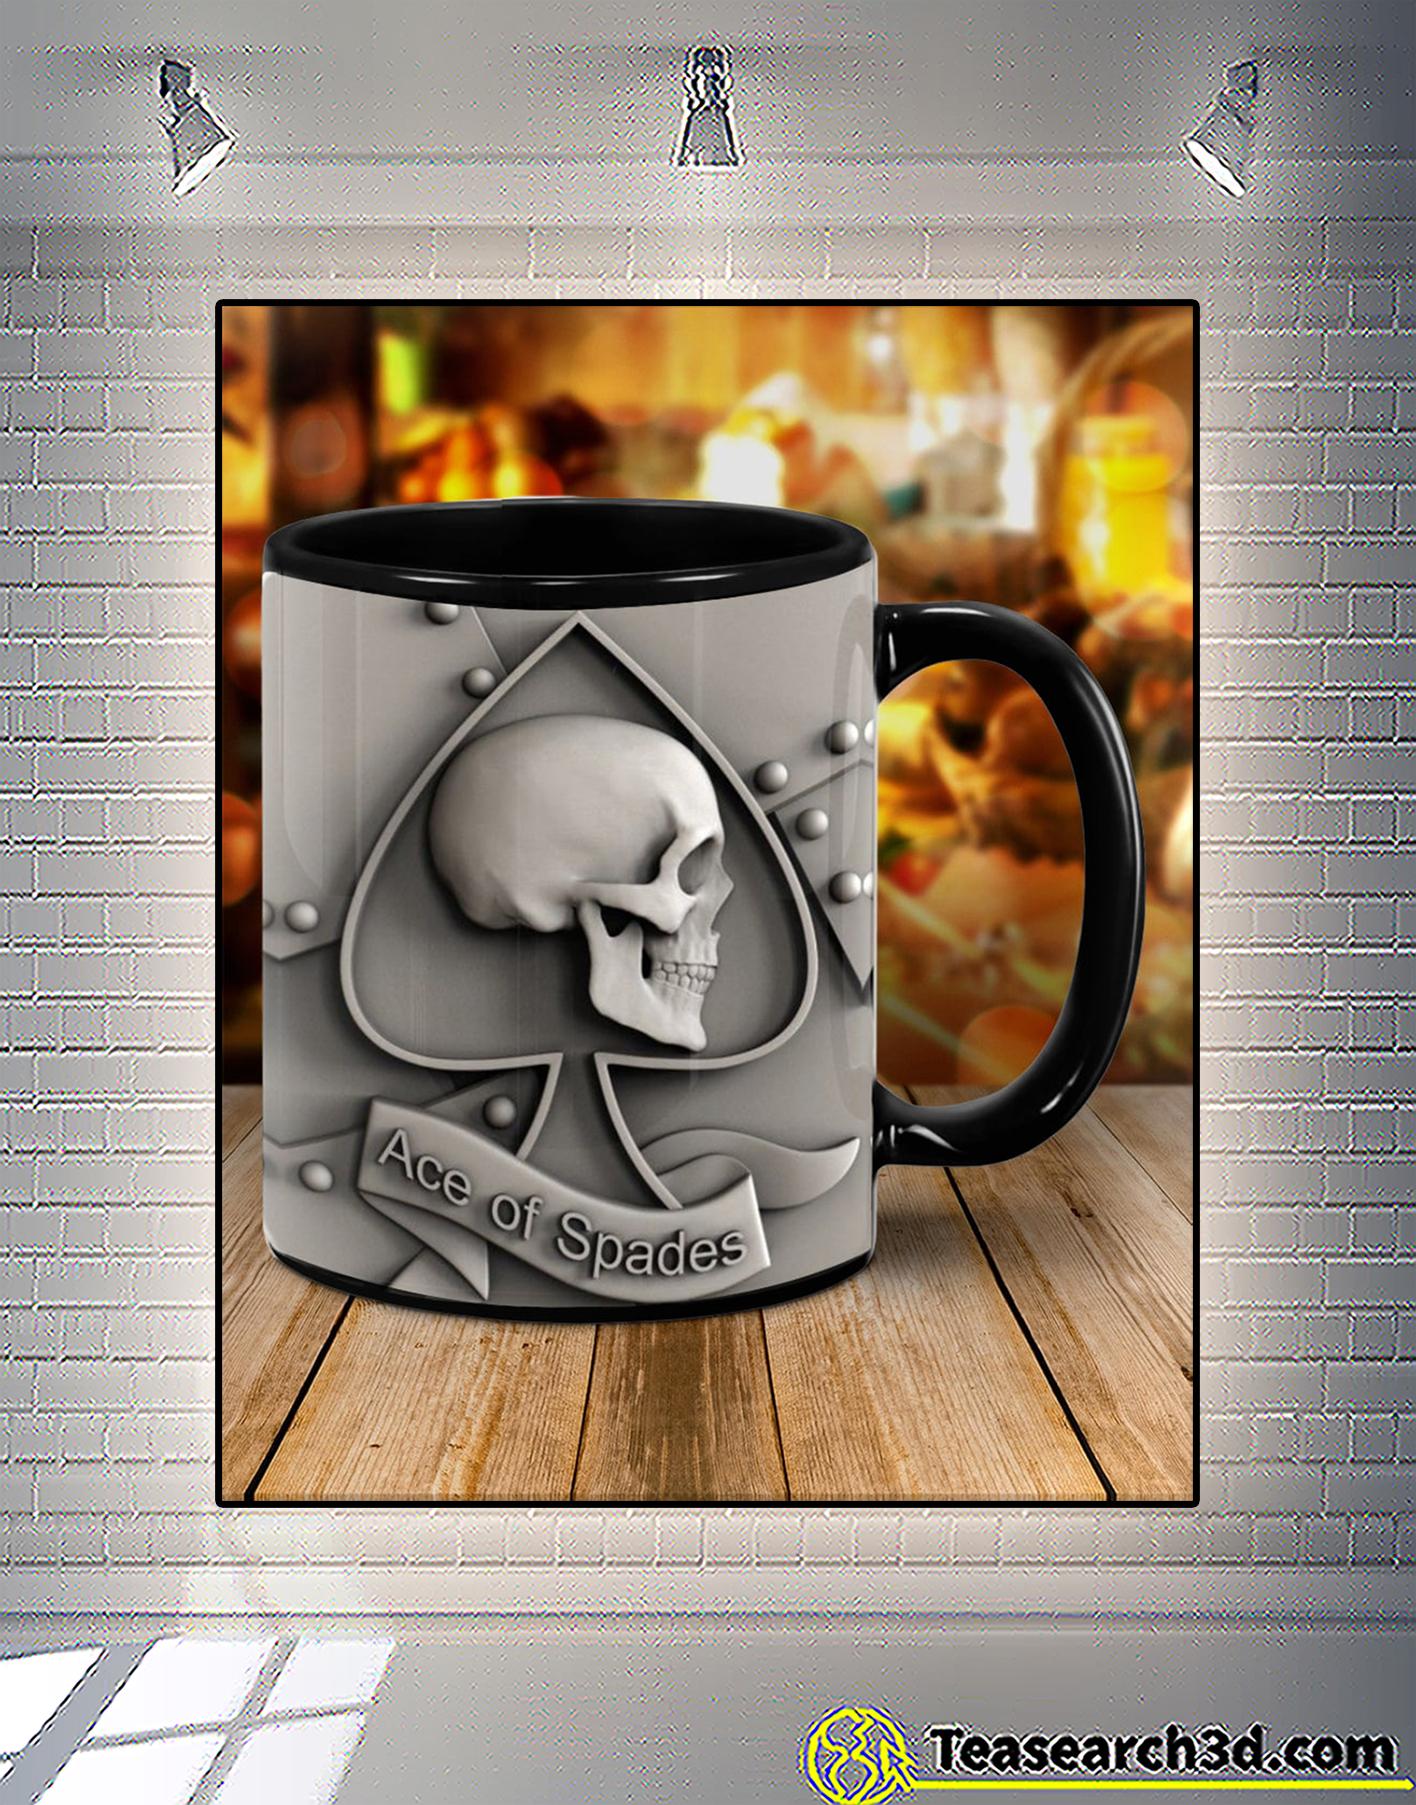 Skull hearts ace of spades mug 1